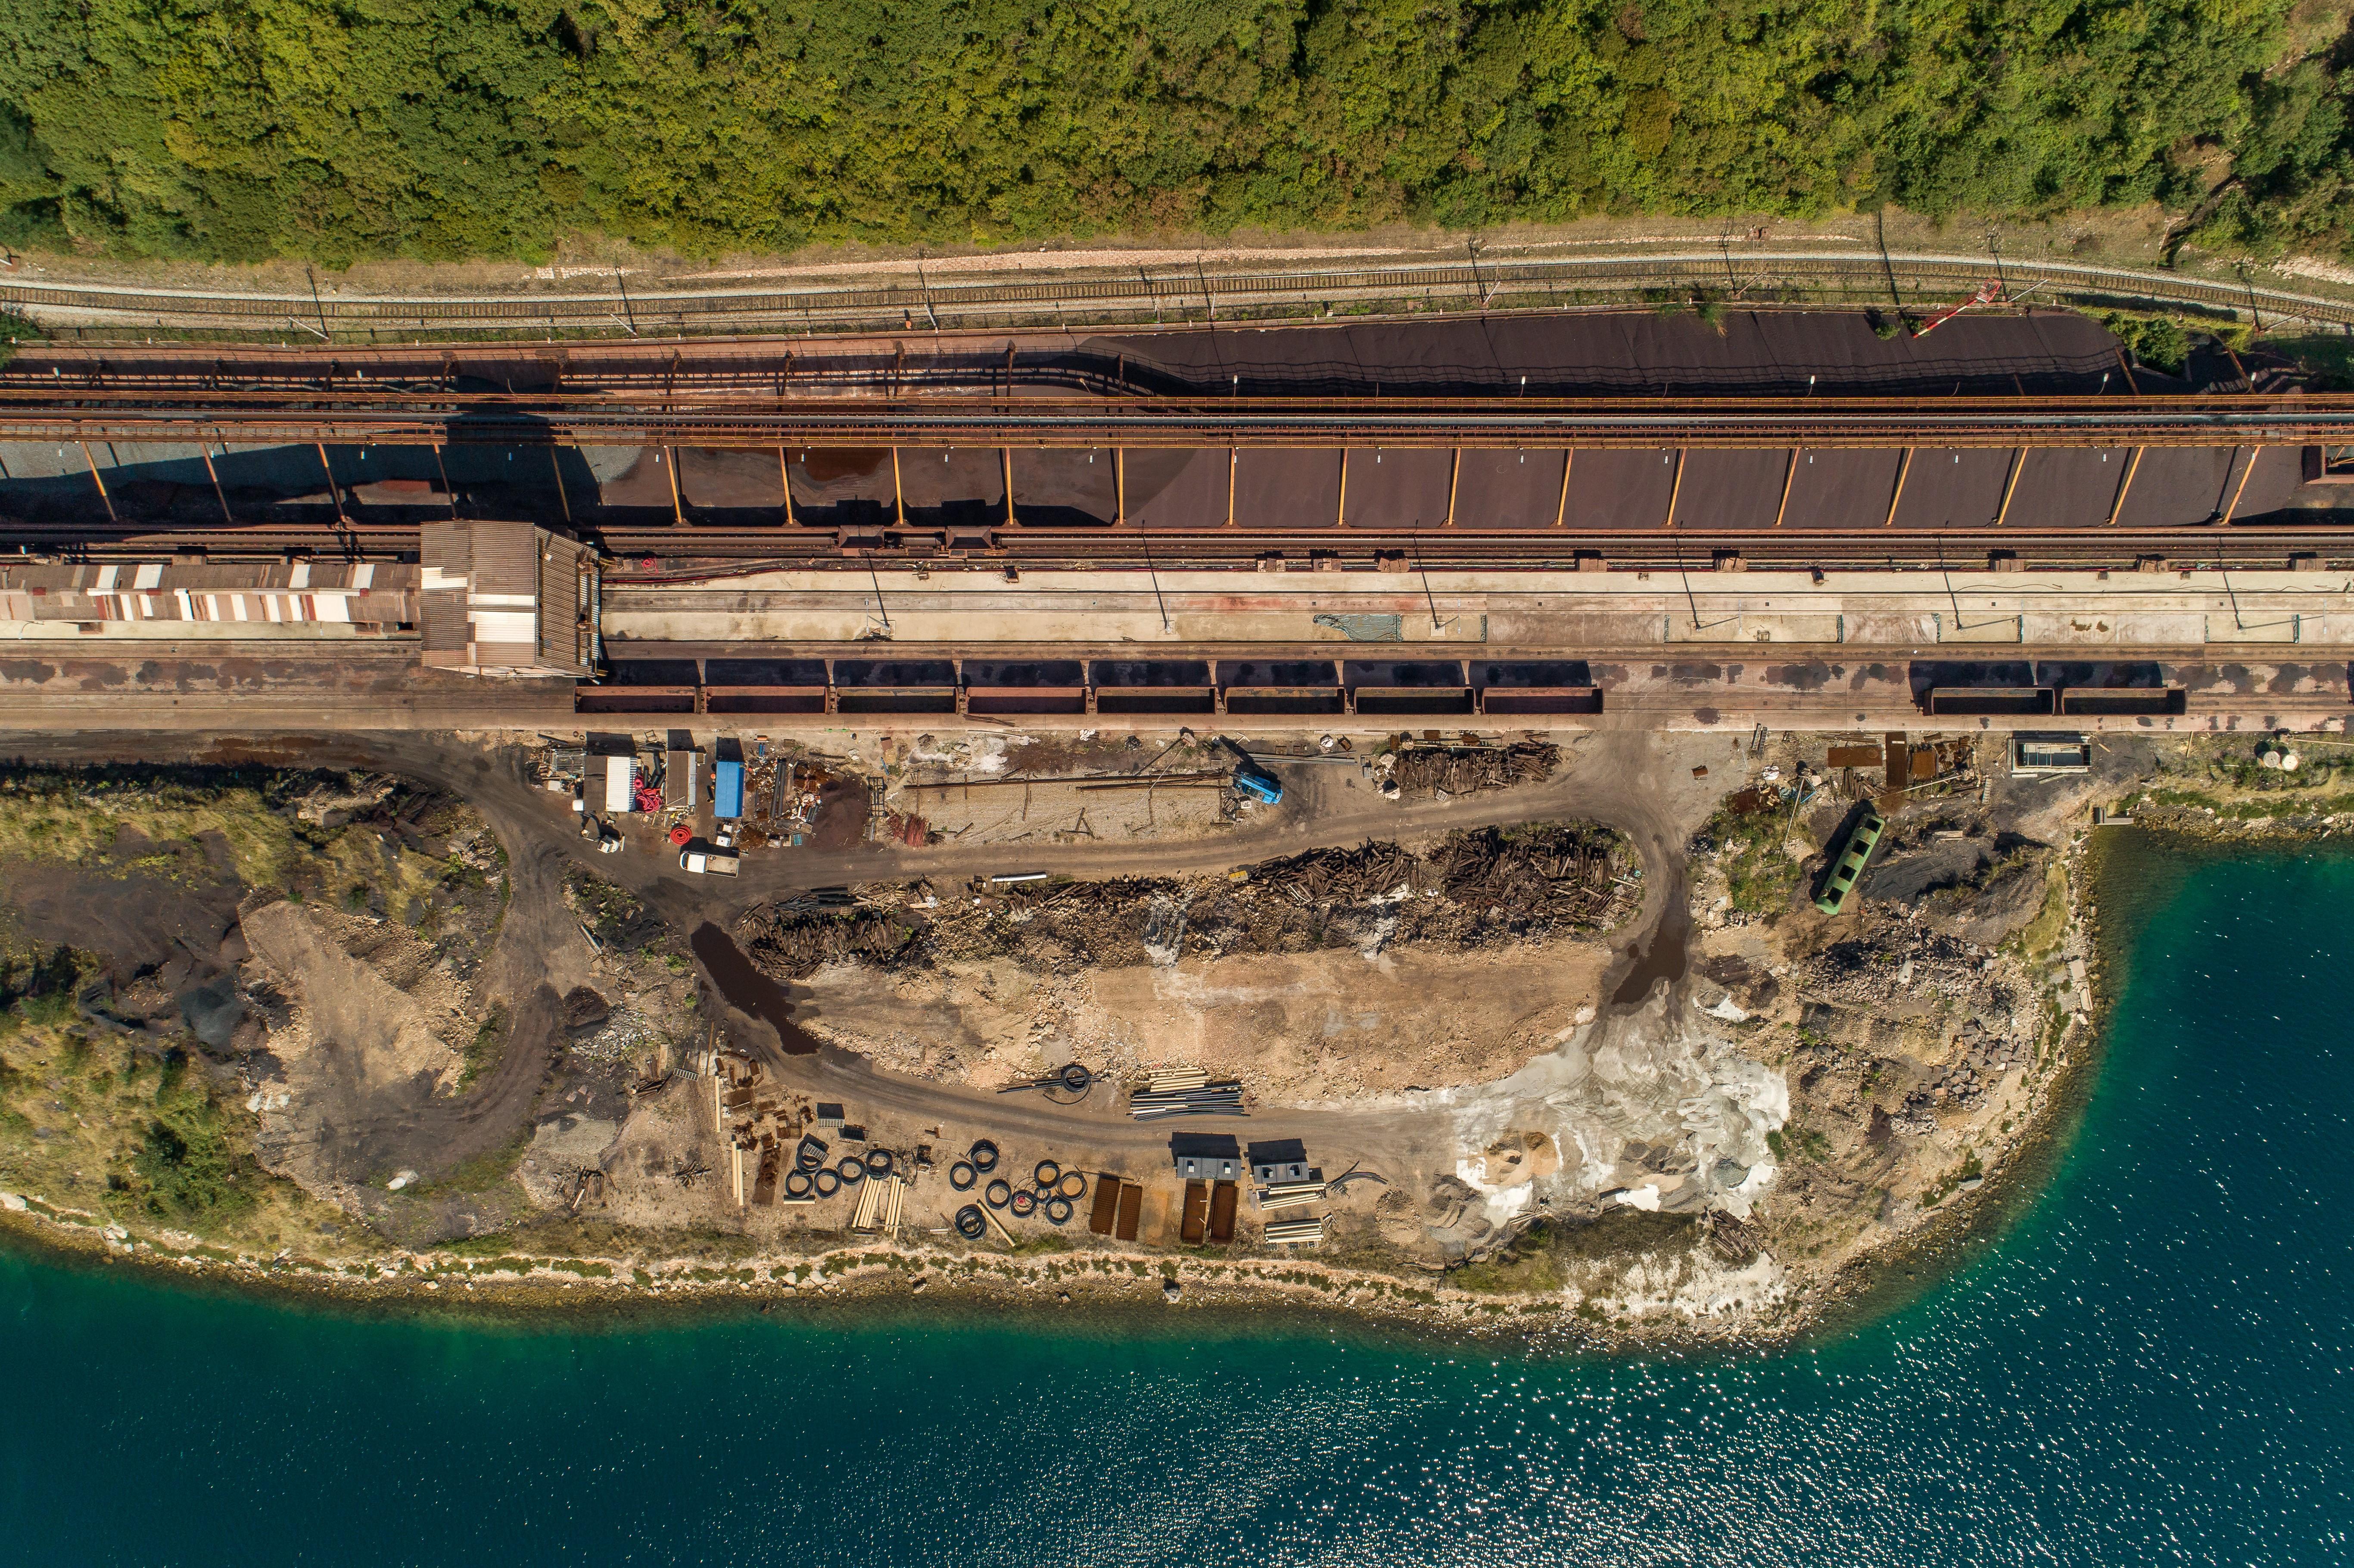 Unaprjeđenje infrastrukture luke Rijeka – terminal za rasute terete Bakar (POR2CORE-BCTB)